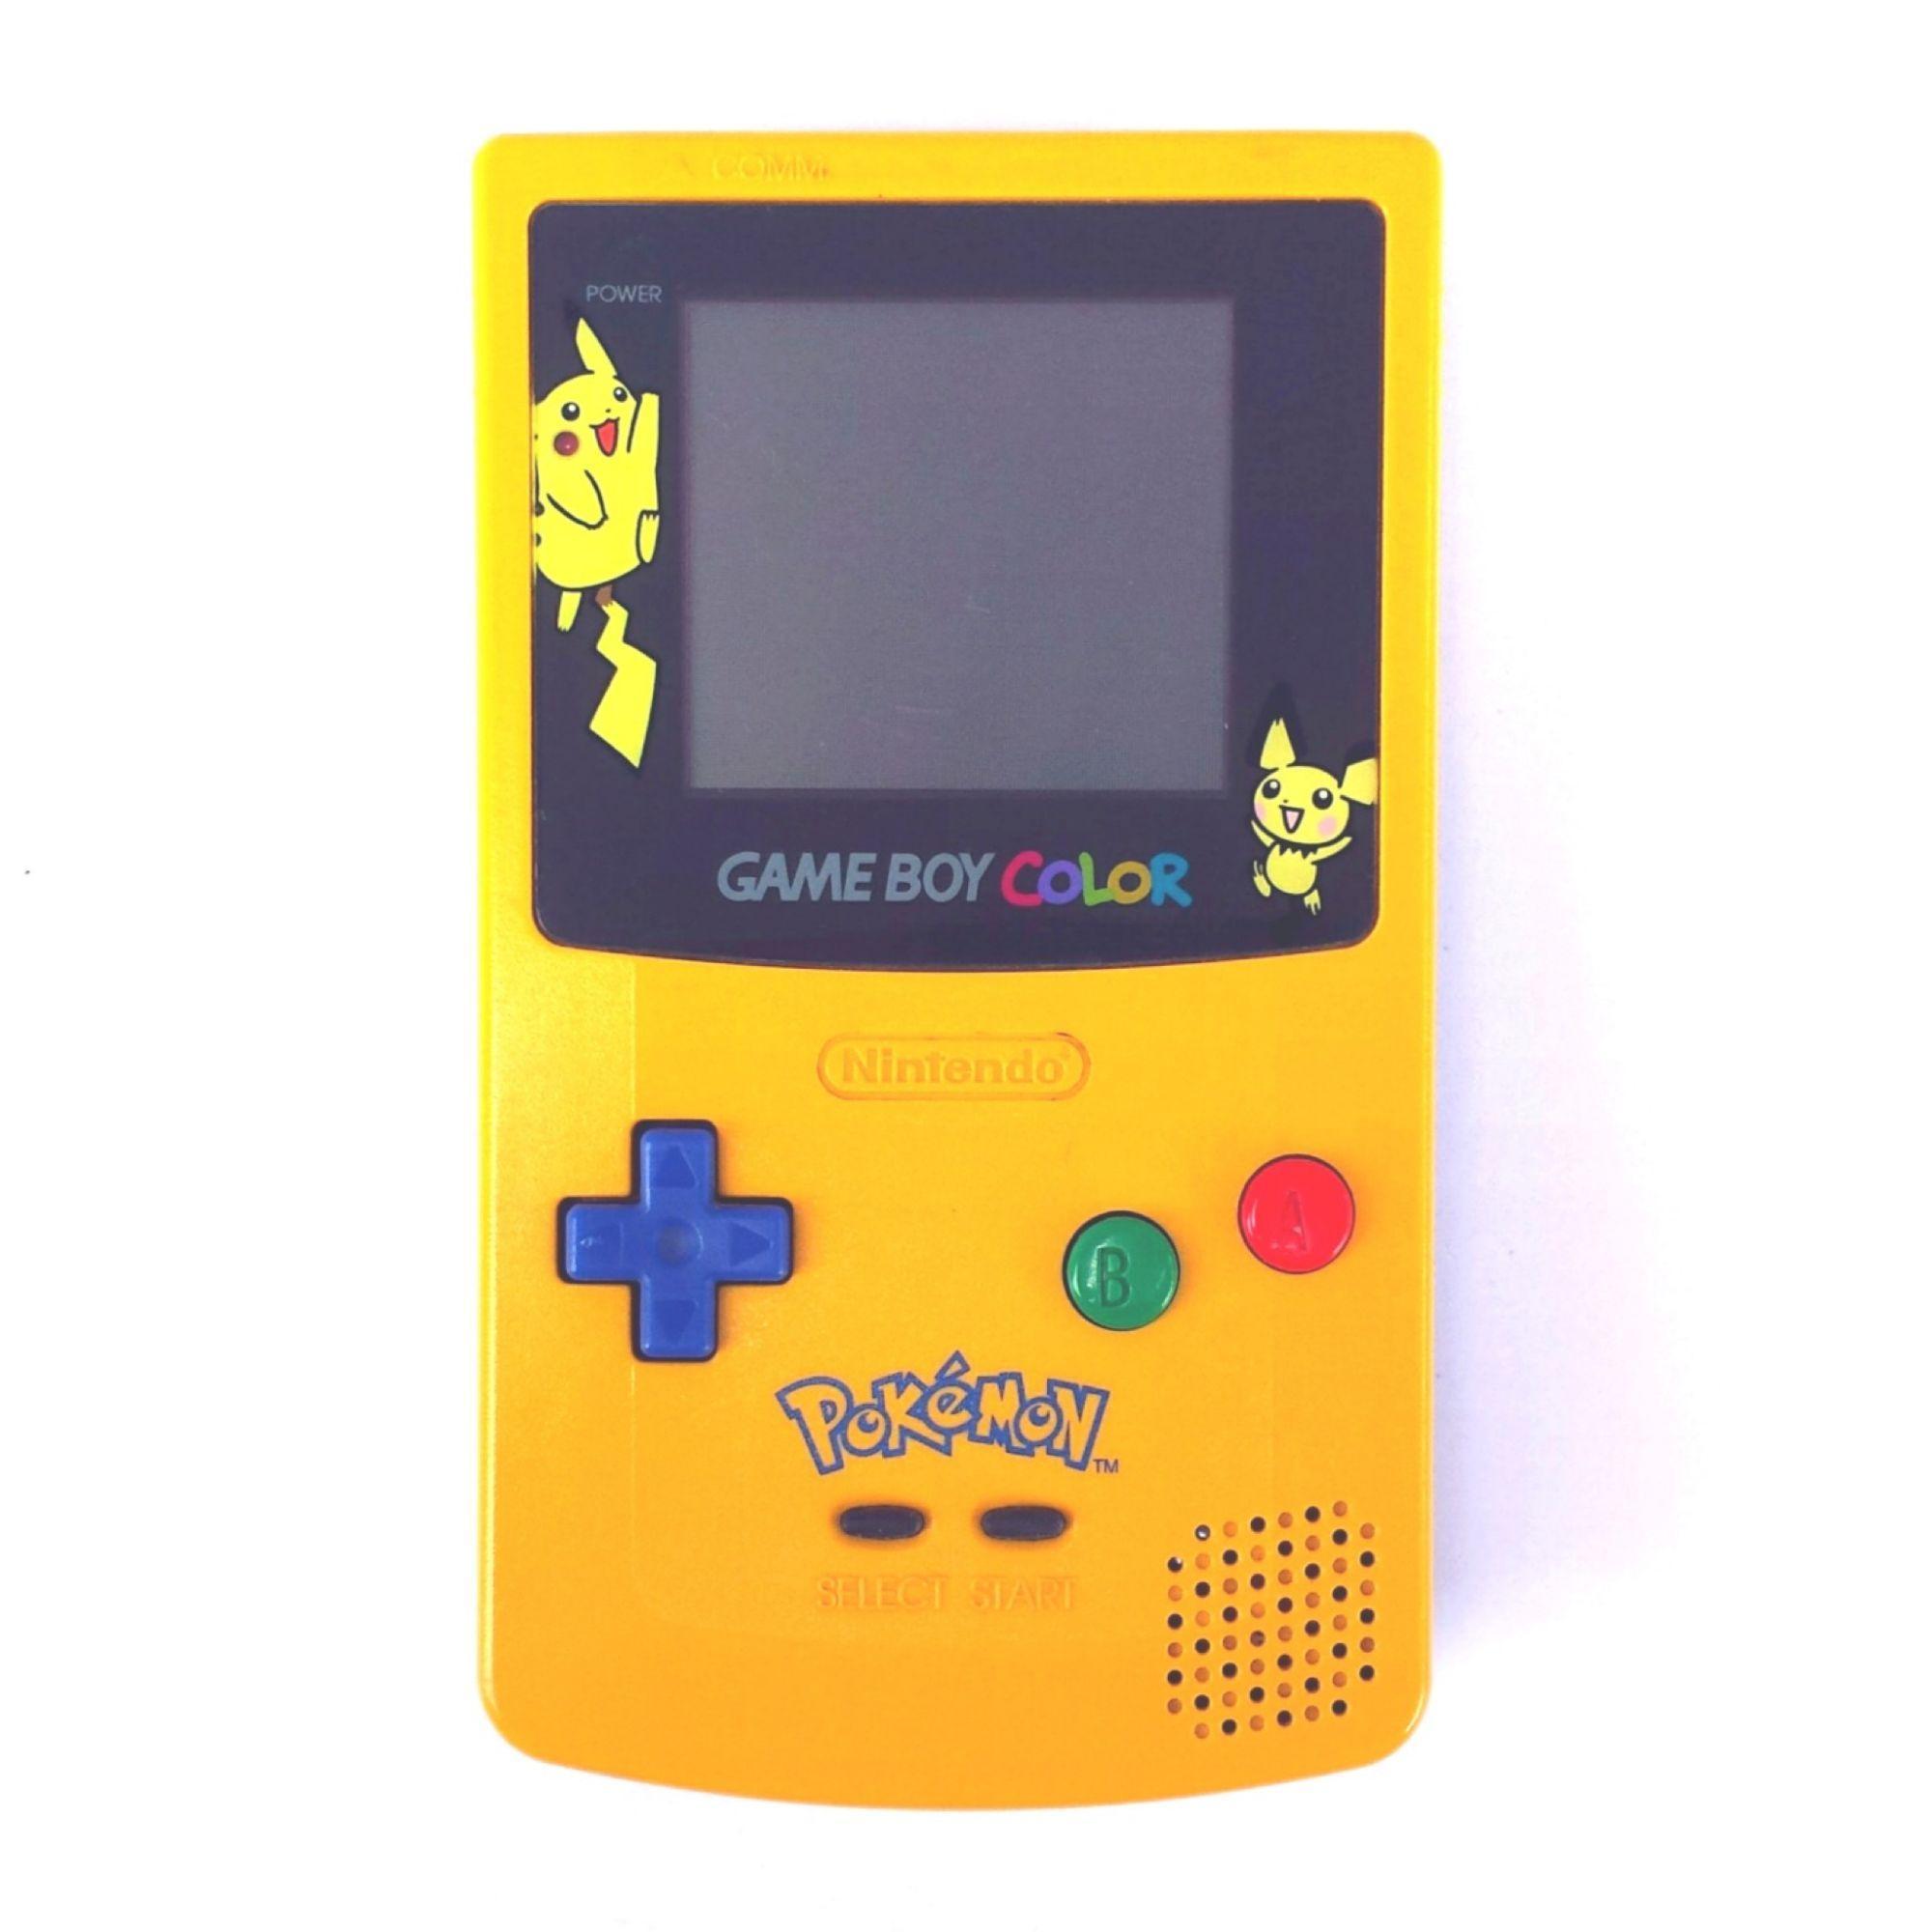 Nintendo Game Boy Color - Edition spéciale Pikachu Pokémon